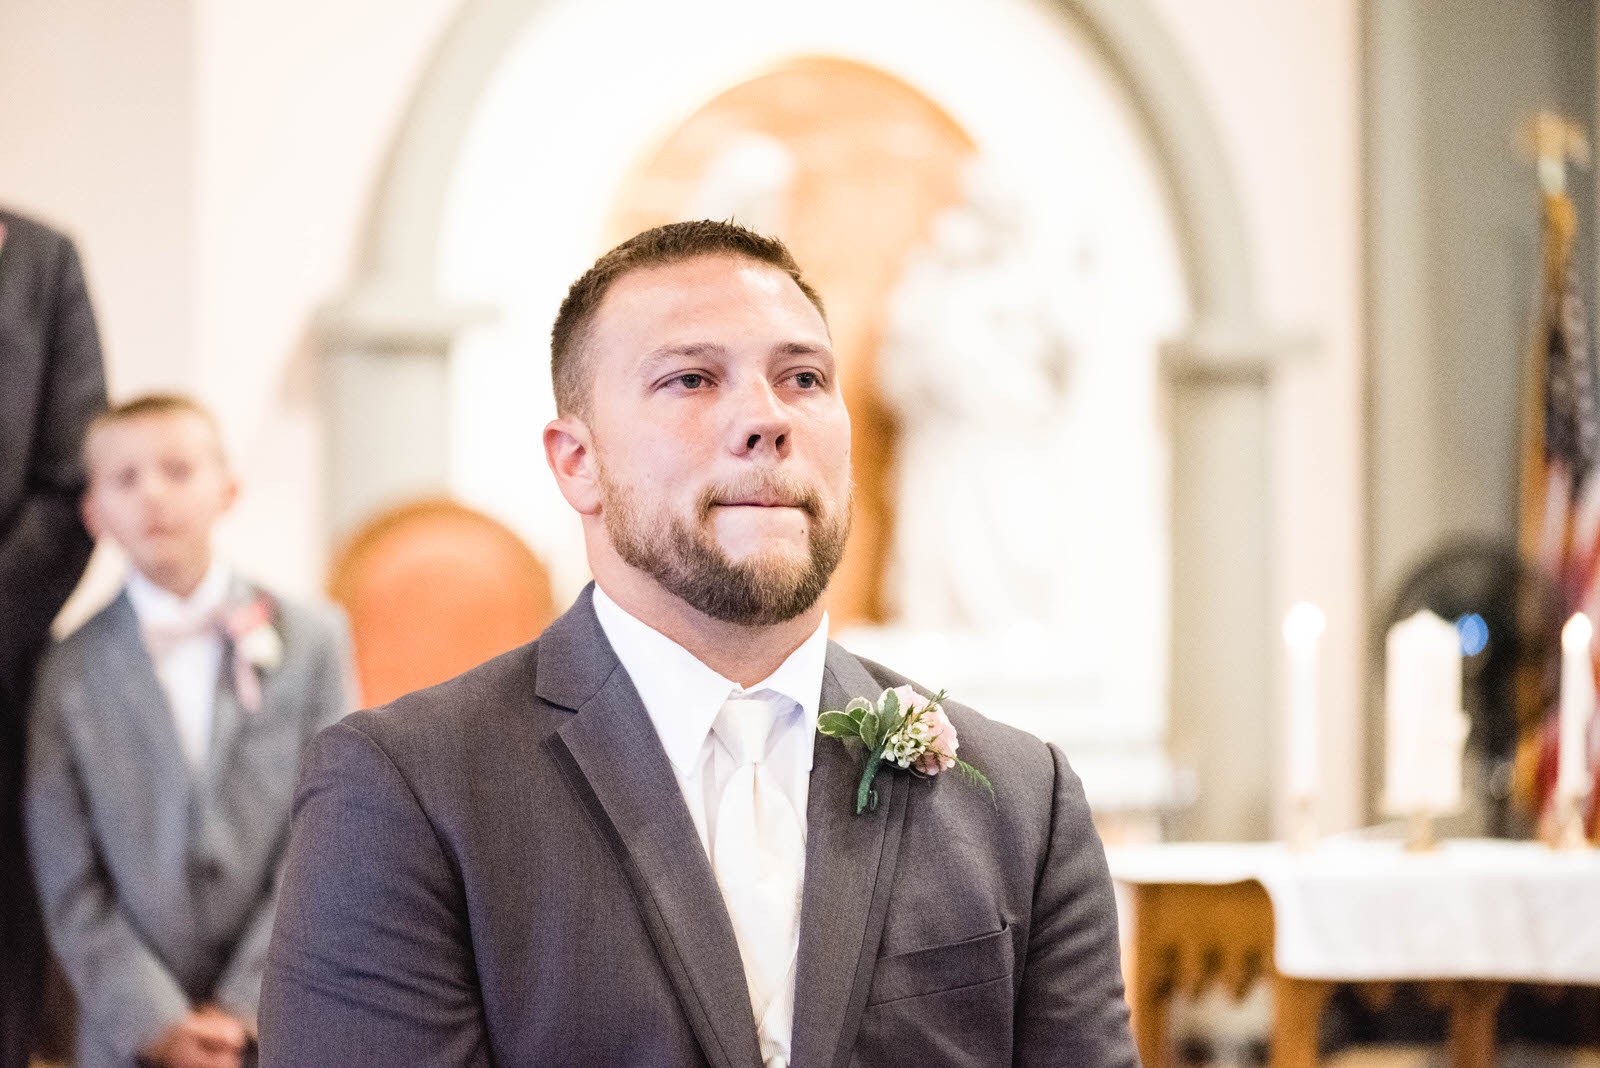 weddings-at-Holy-Cross-Greek-Orthodox-Church-and-Hall-45.jpg